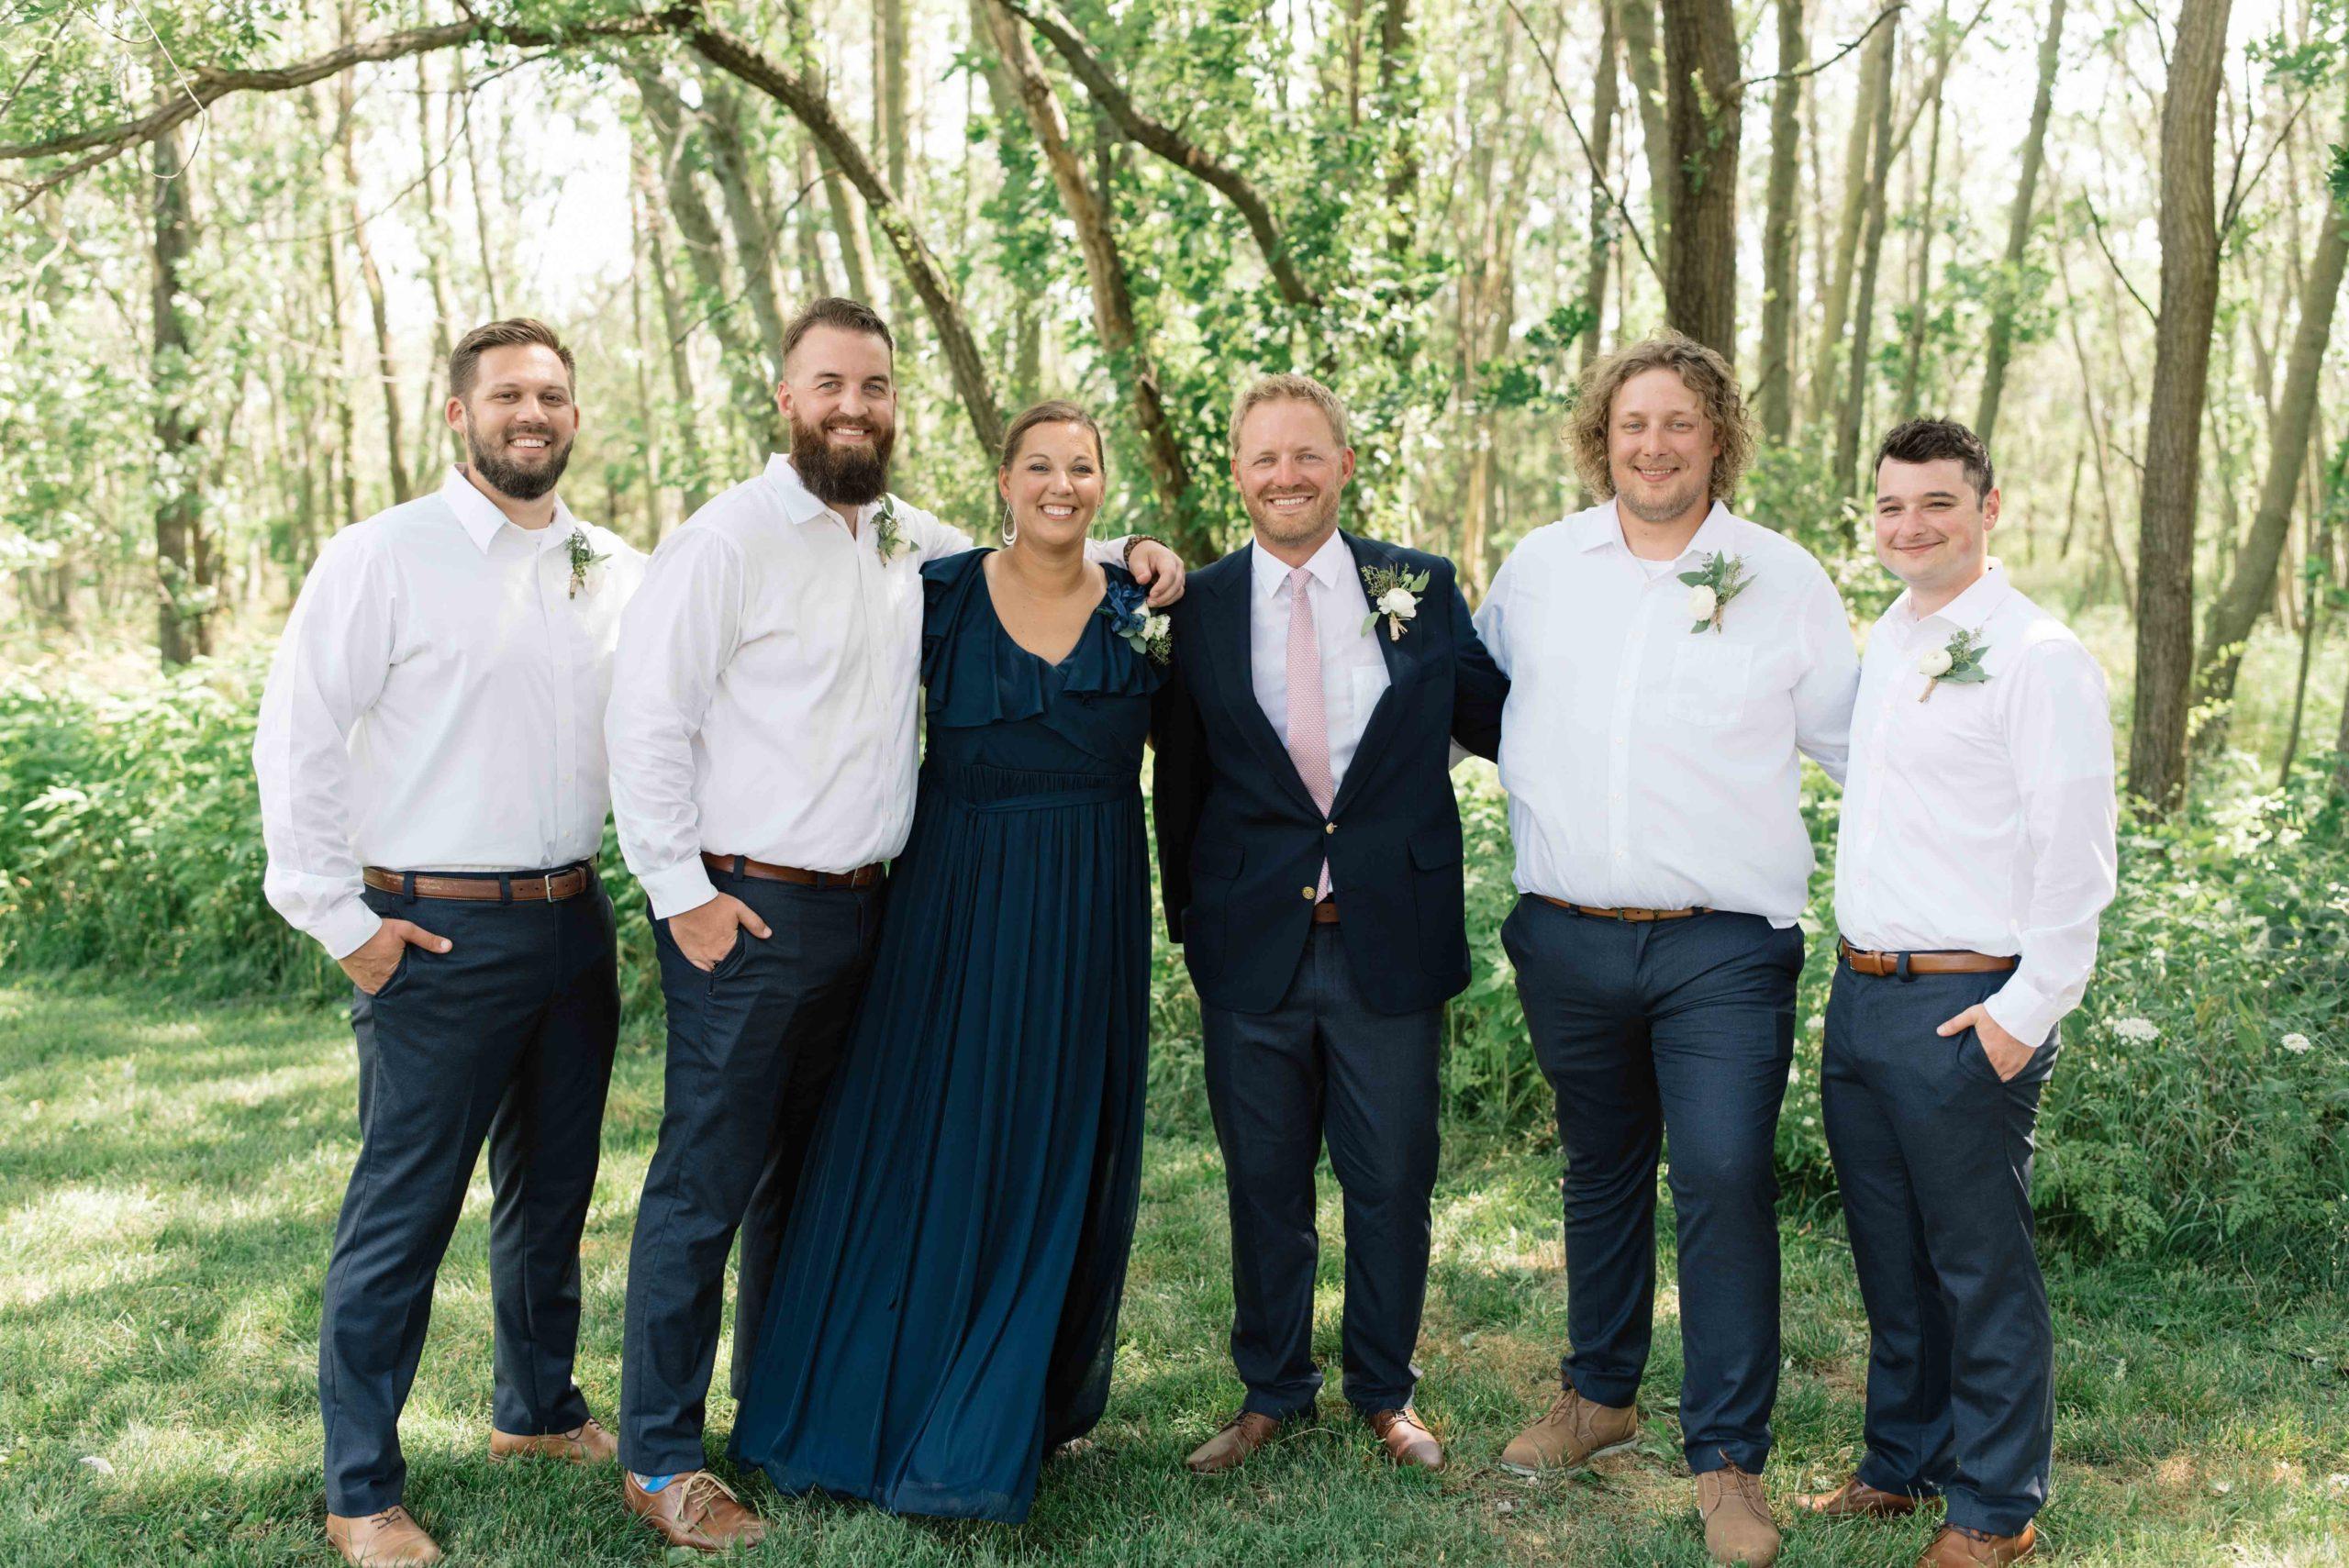 groomsmen laughing with groom schafer century barn Iowa wedding venue